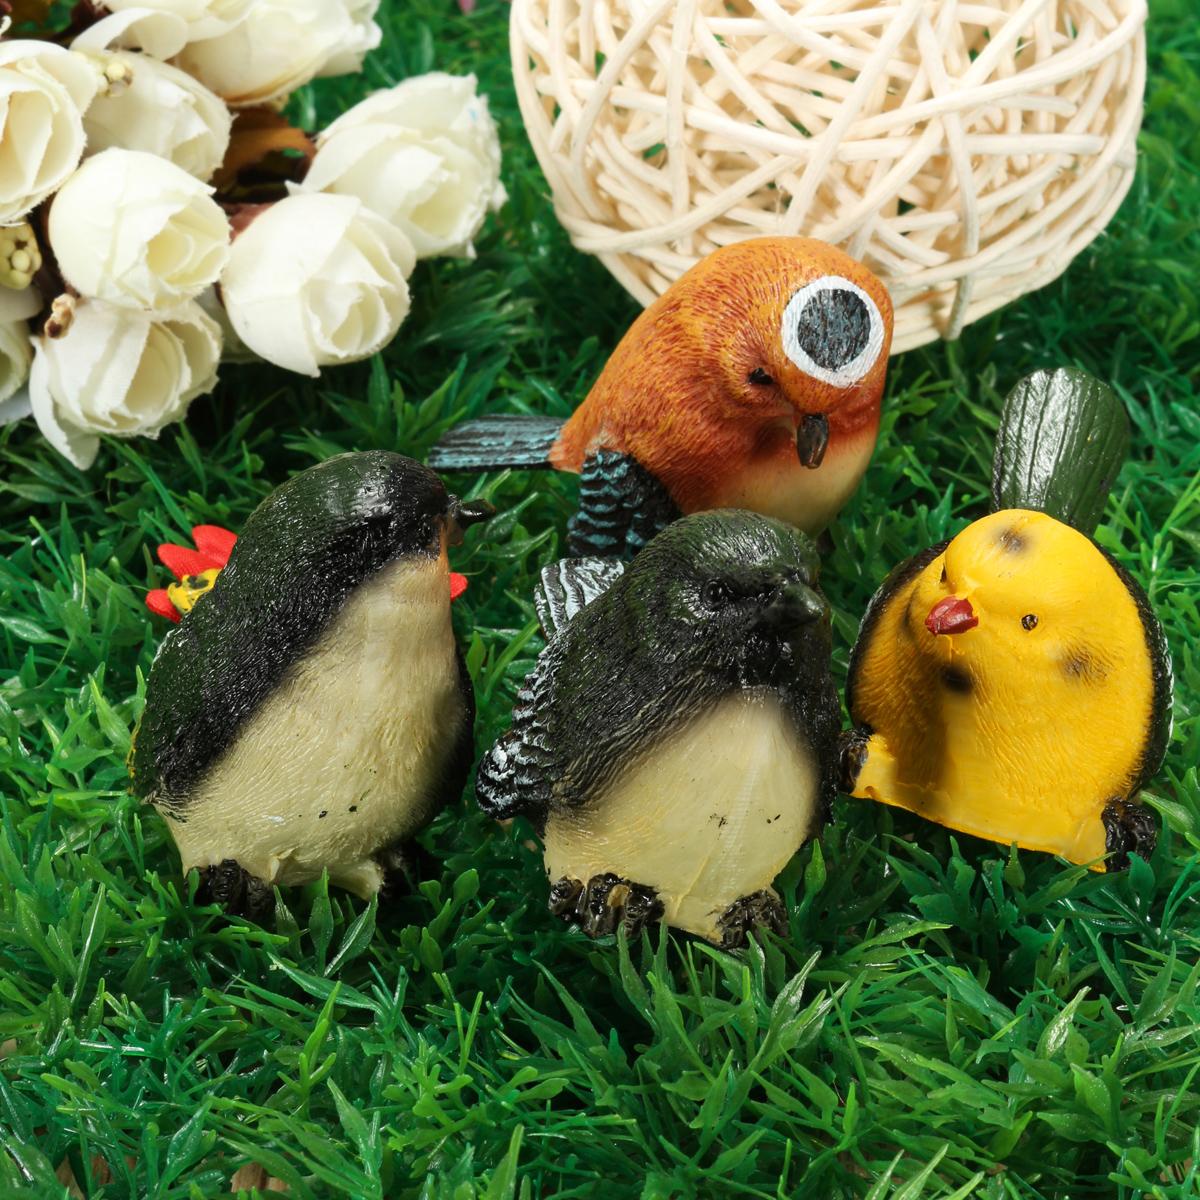 4 Pcs/Set Resin Birds Statue Figurine Home Garden DIY Bonsai Desk Decor Ornament Decorations